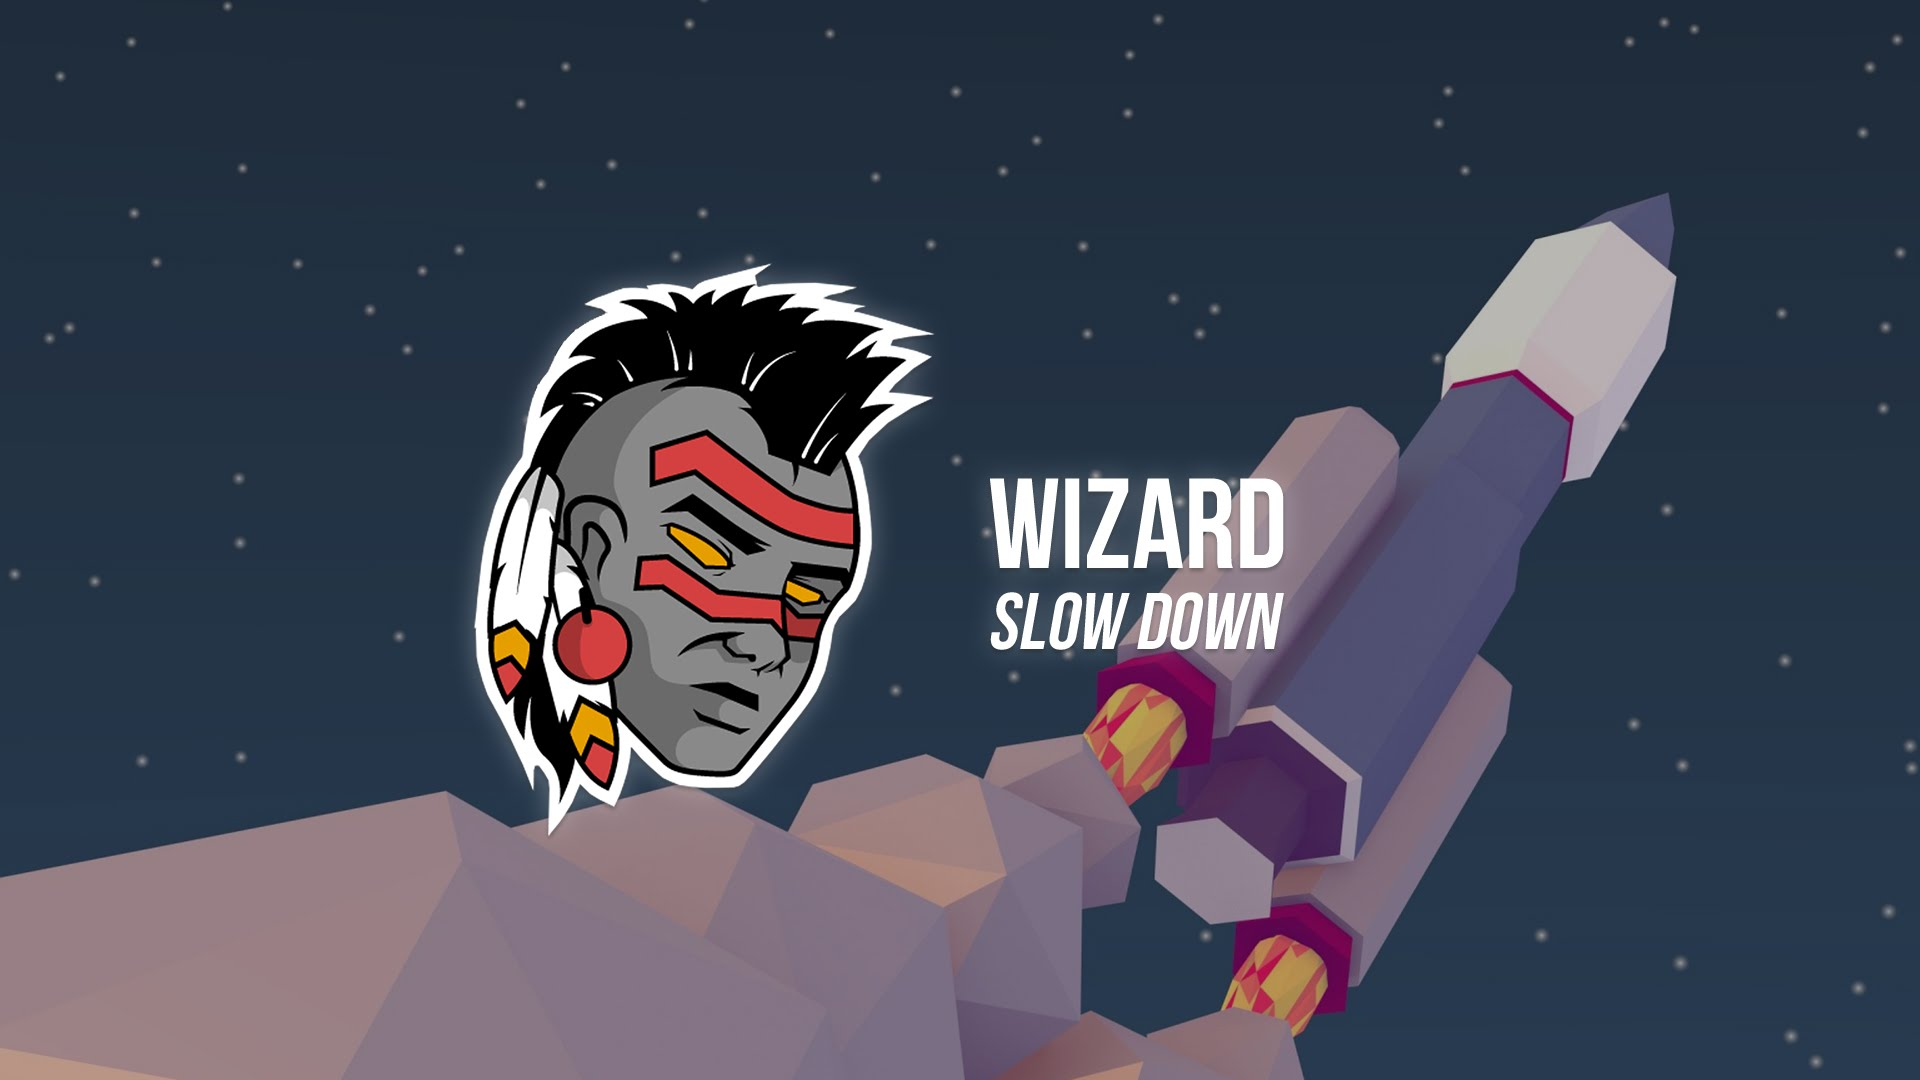 Wizard - Slow Down ft. ¥en